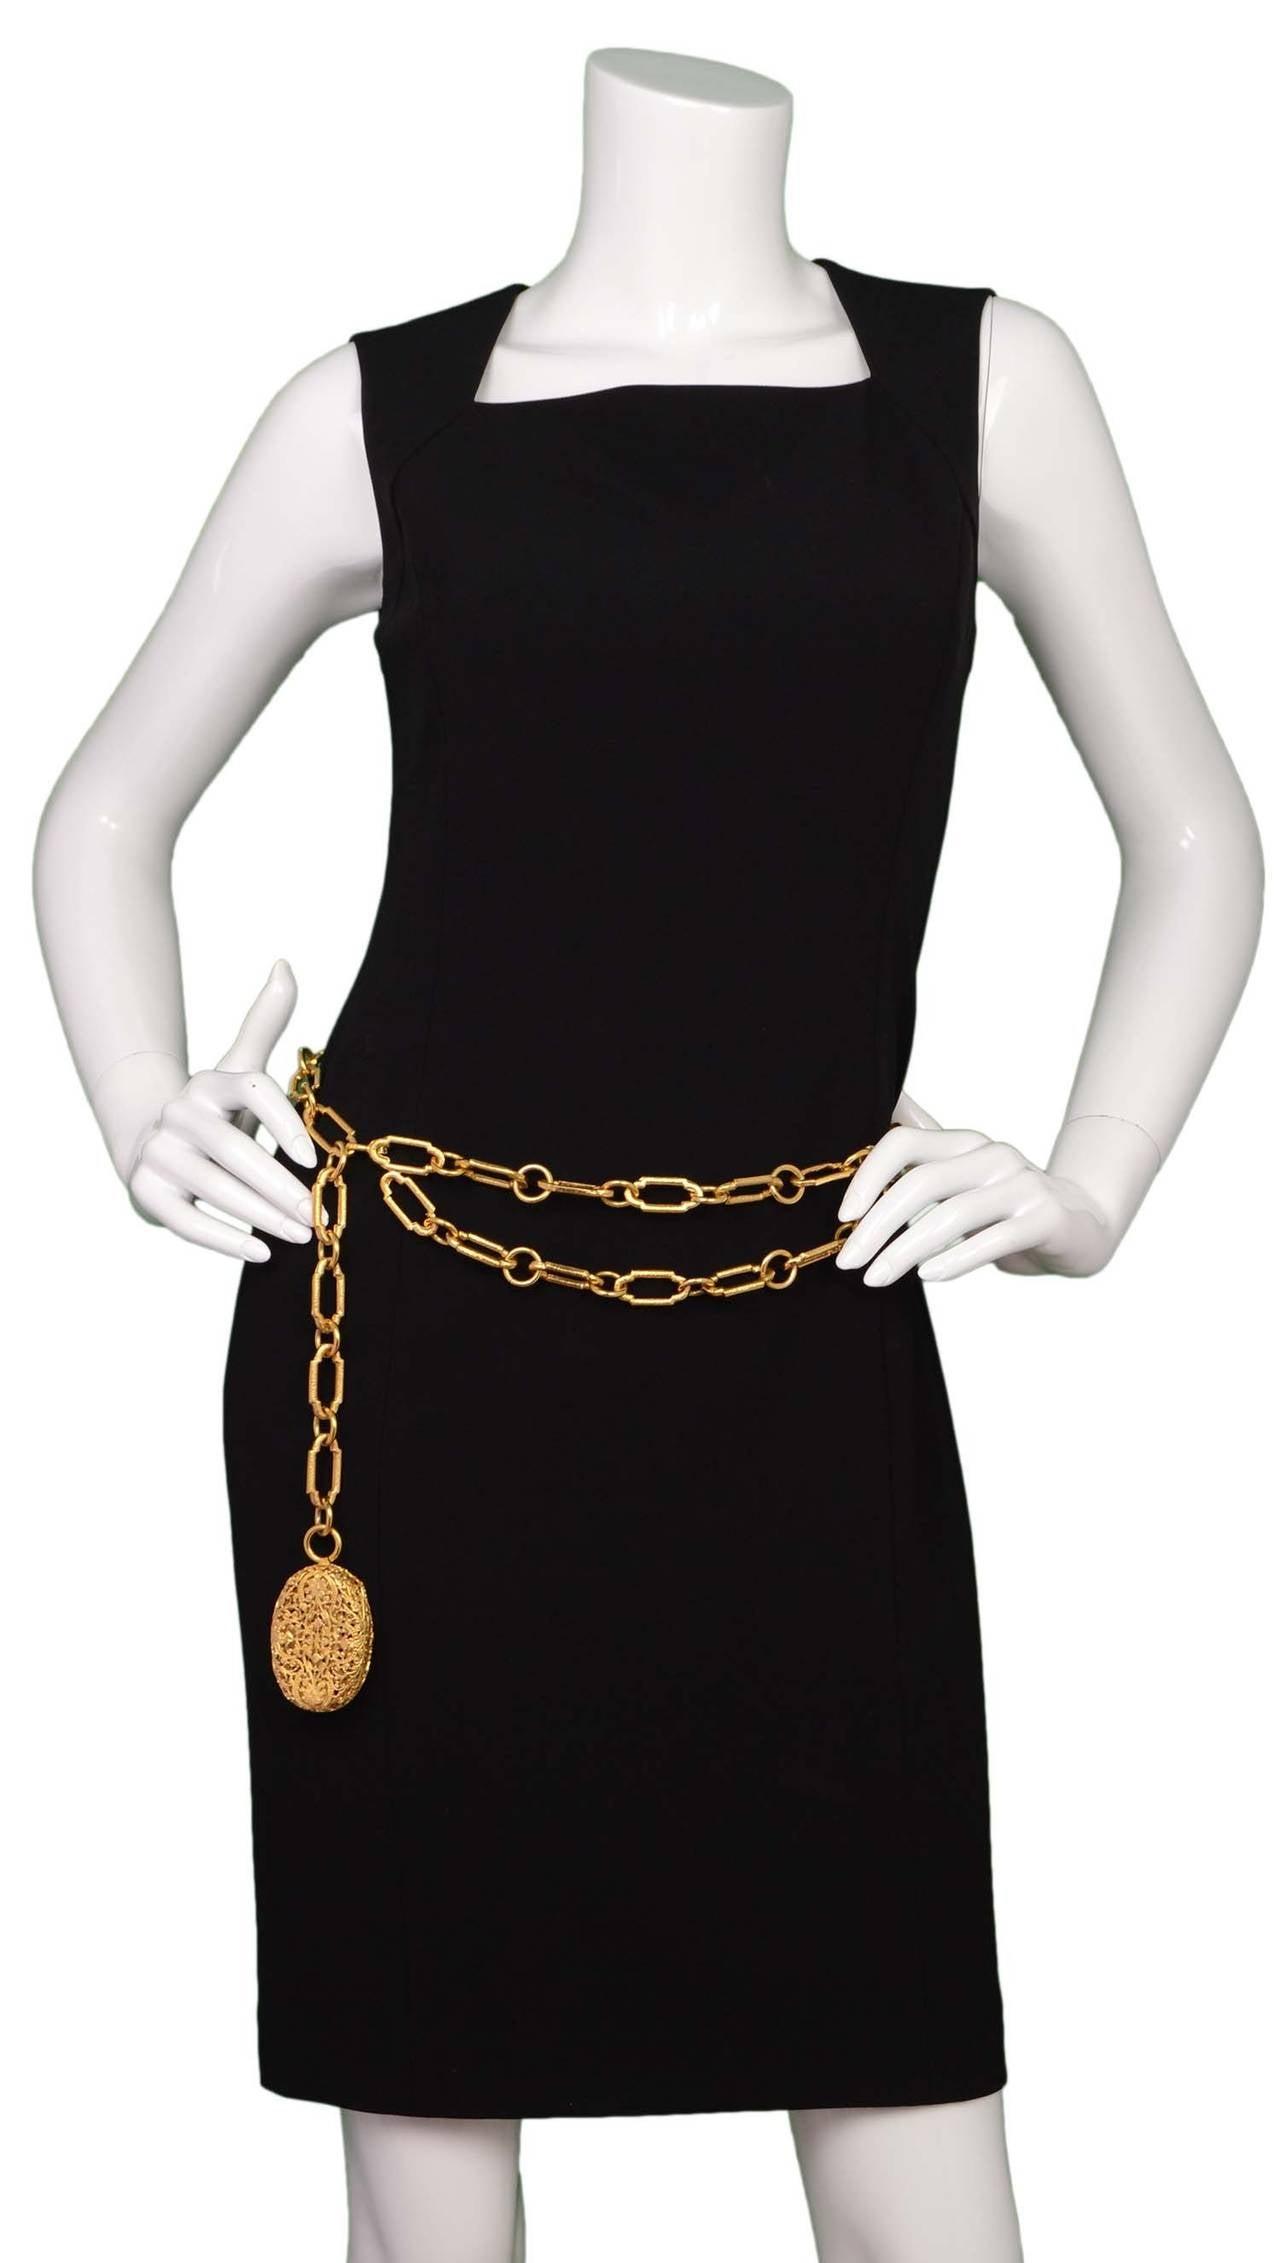 CHANEL Gold Chain Link Filigree Medallion Belt 5